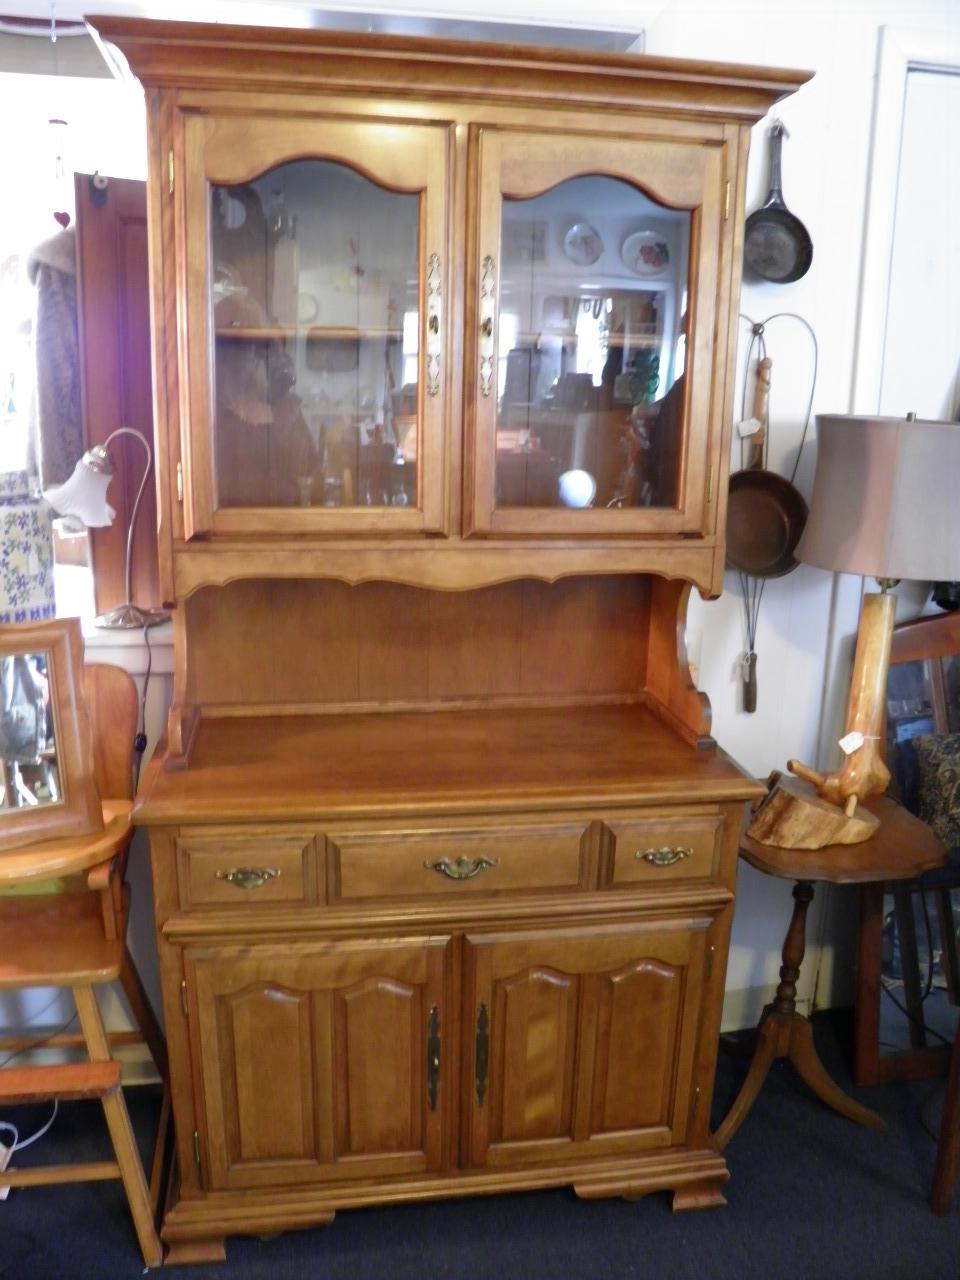 Vintage maple Cabinet 275.00